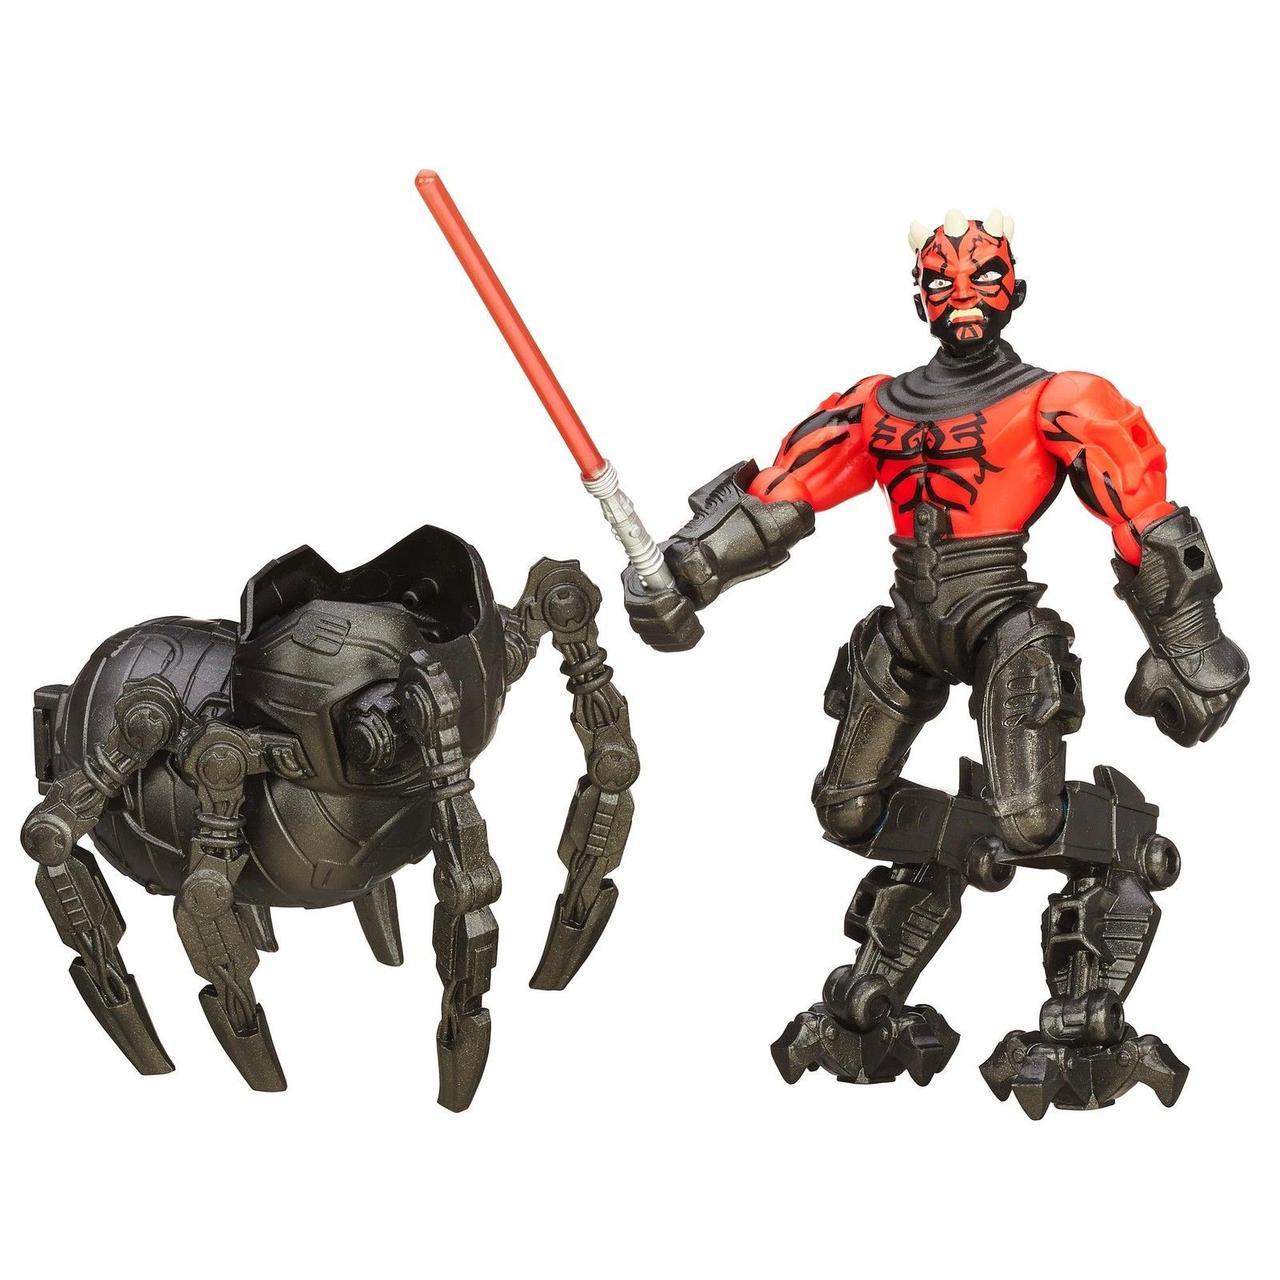 Разборная фигурка Звездные войны Дарт Мол 15 см. Оригинал Hasbro Hero Mashers B4160/B3666